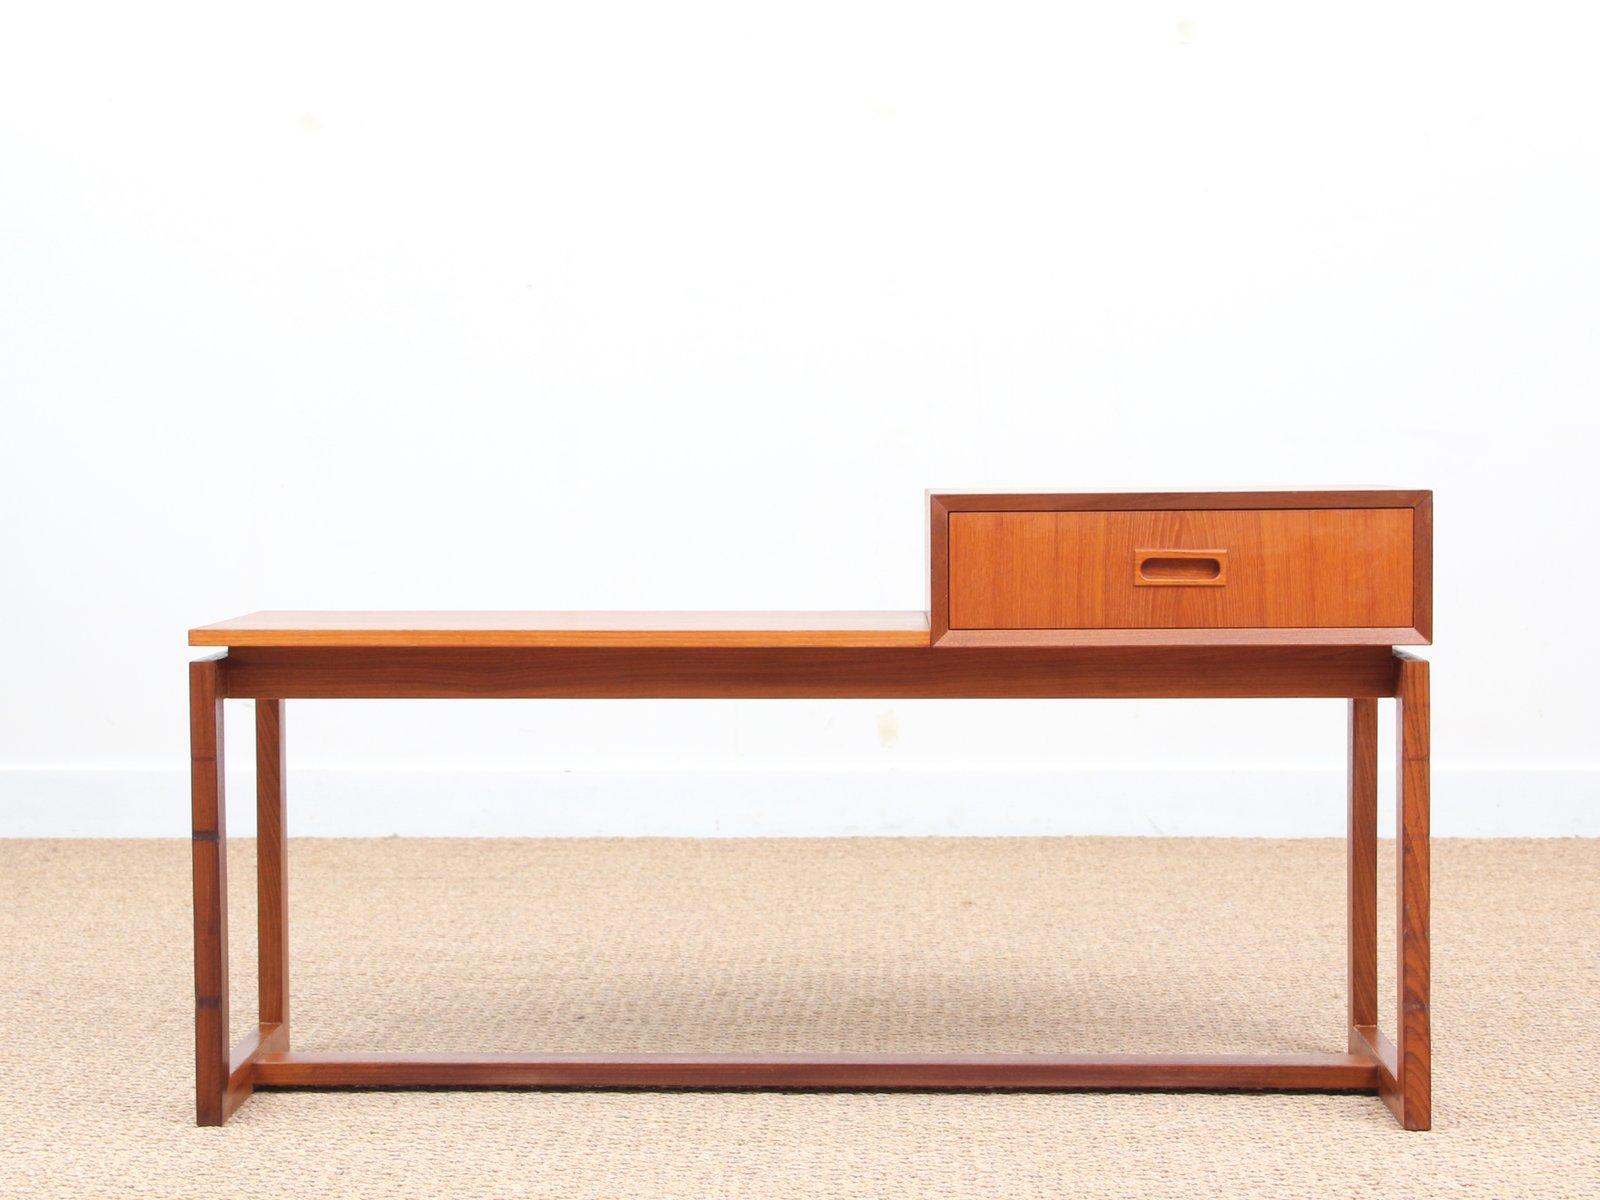 midcentury teak bench u0026 mirror 1960s - Teak Bench